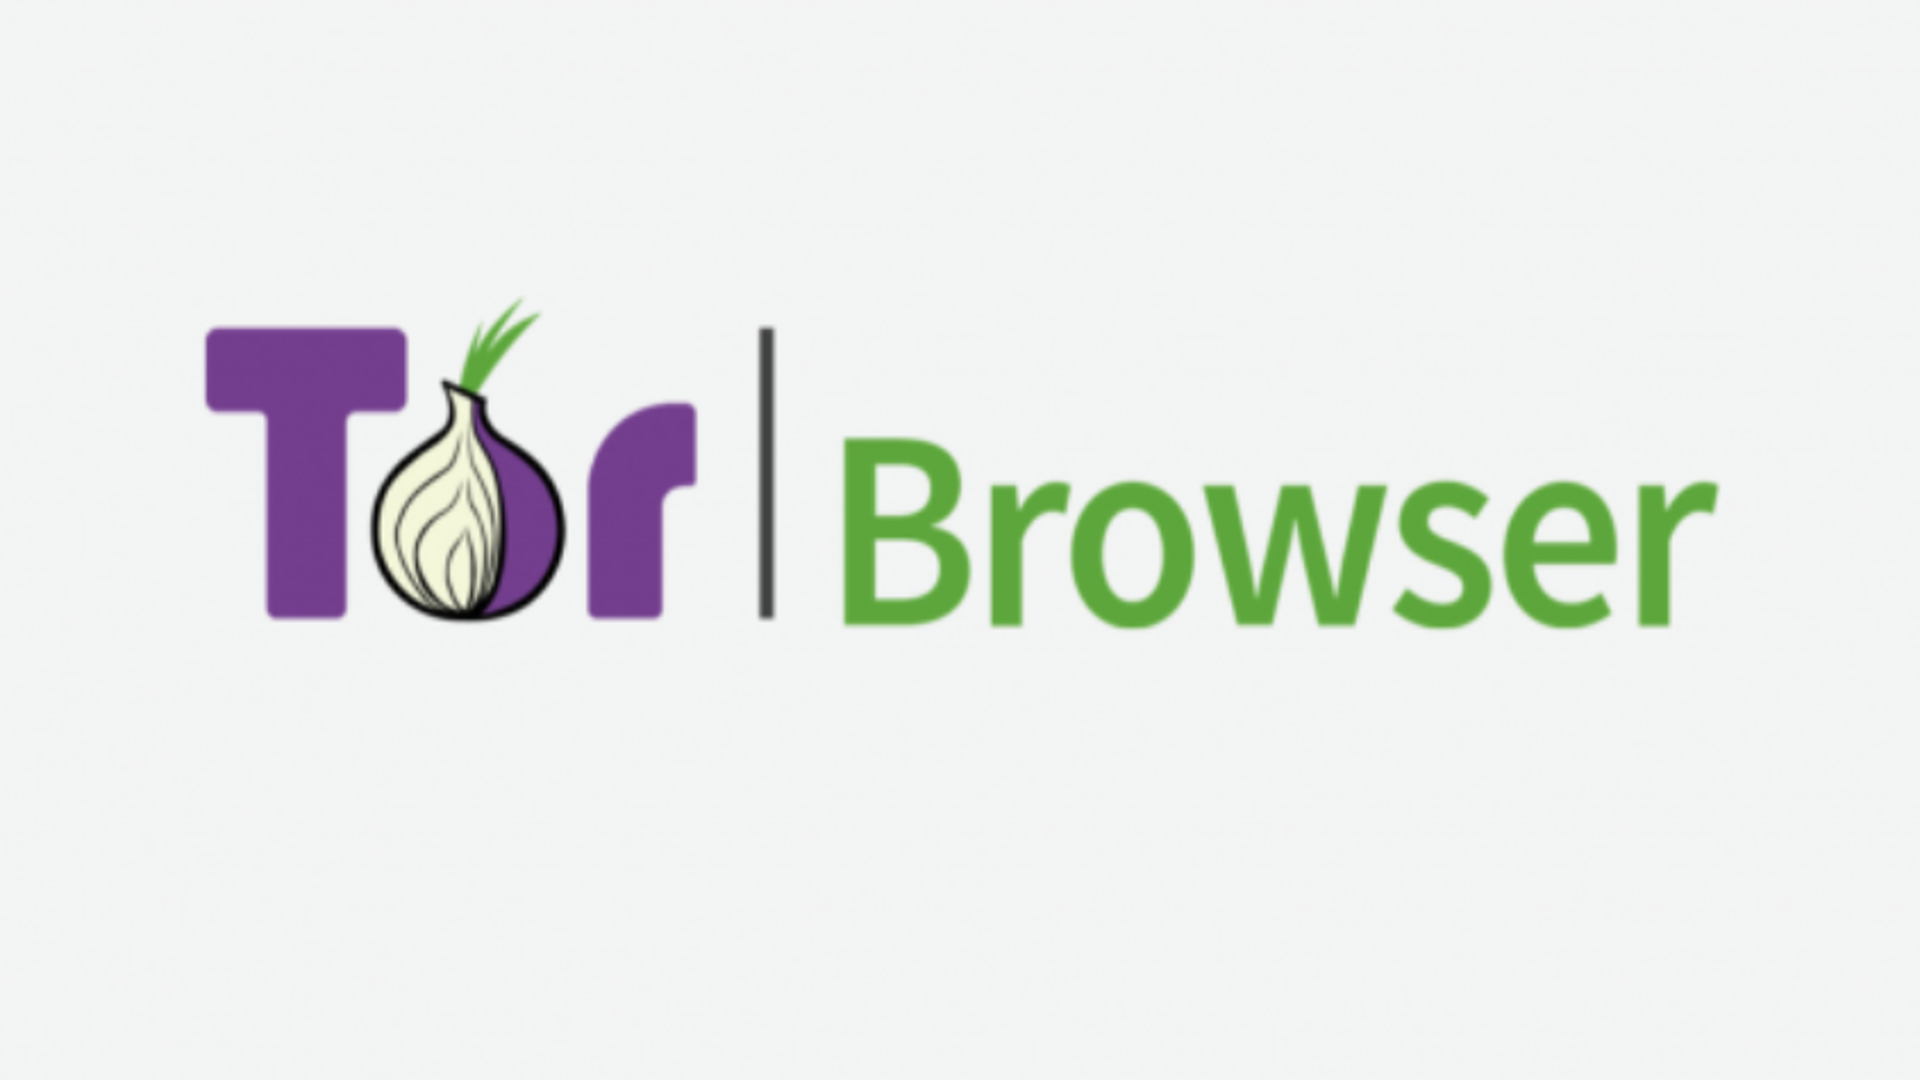 Тор браузер для айфона отзывы hyrda вход темный интернет тор браузер hidra